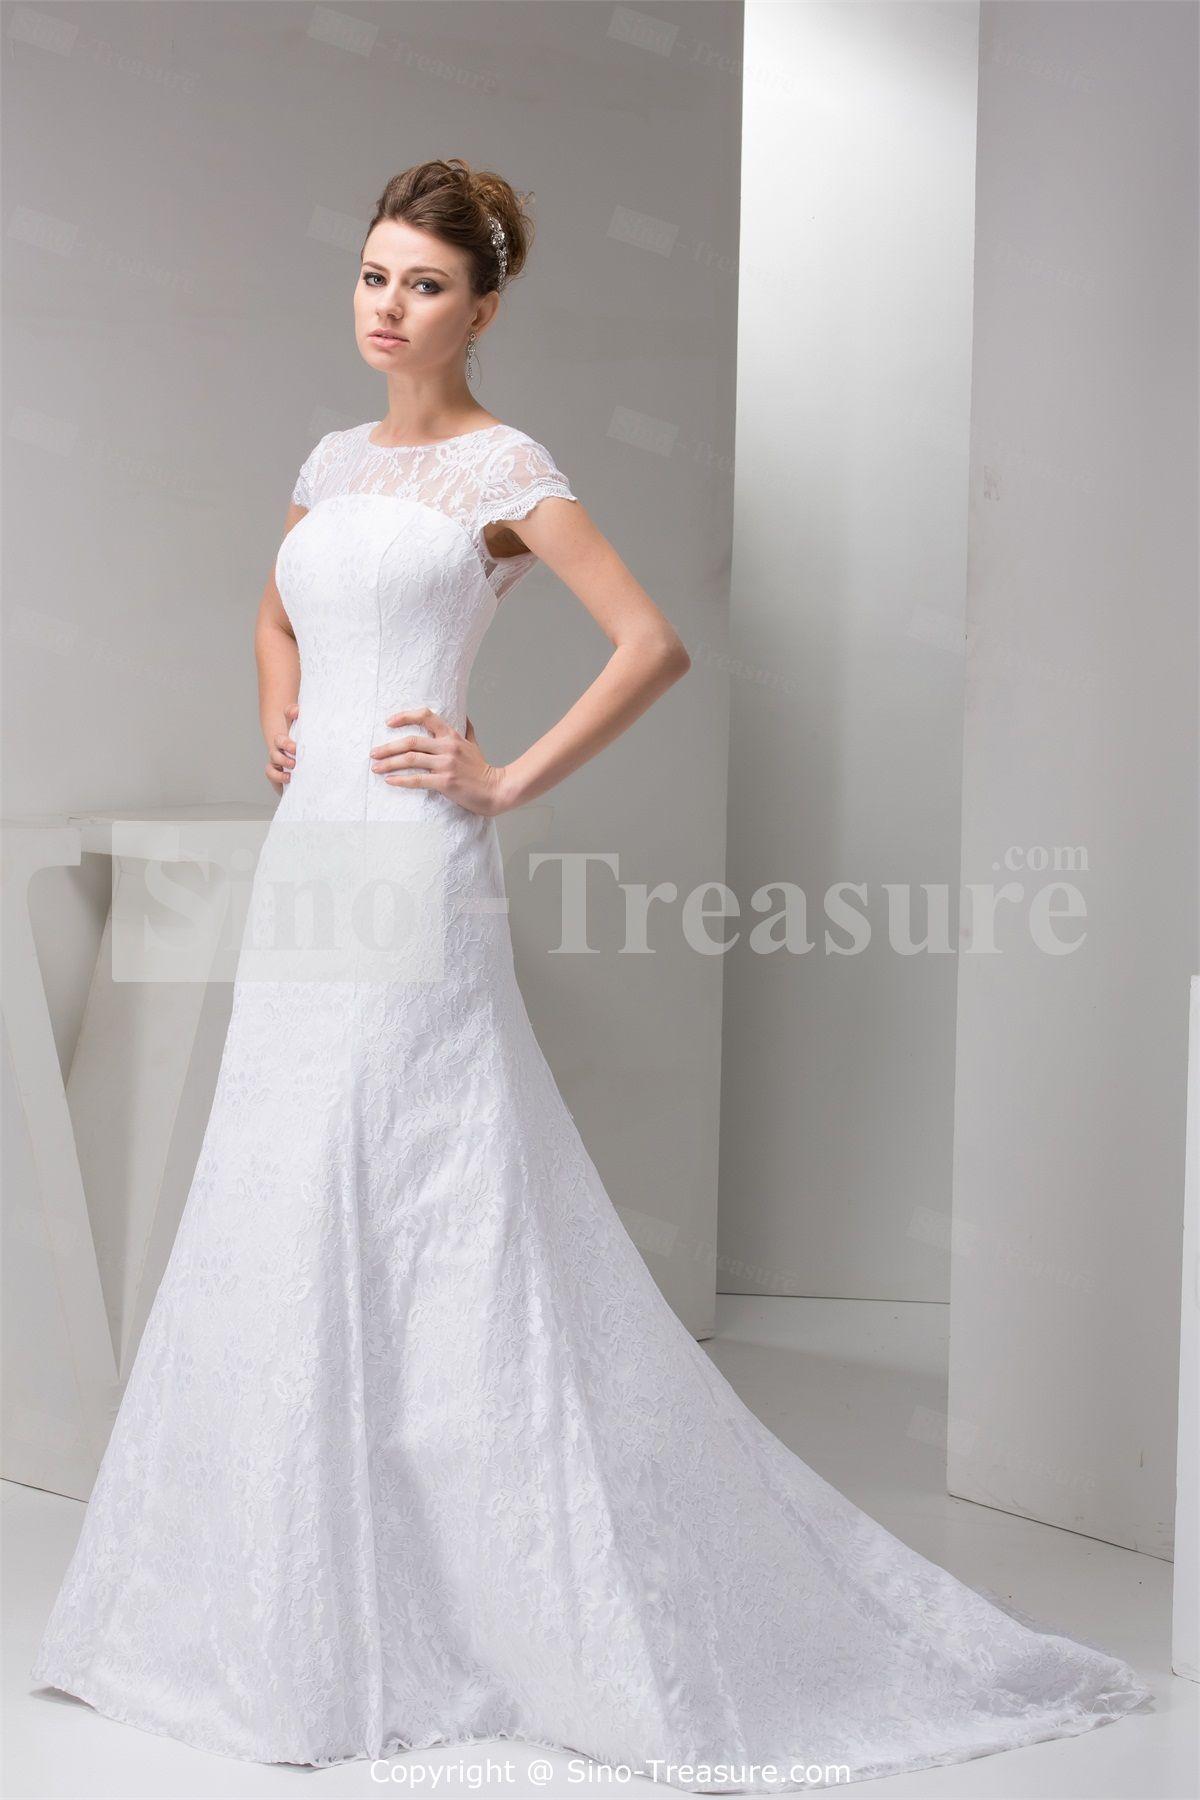 Back out wedding dresses  Charming White Sleeveless Outdoor Garden Satin Zipperback Wedding